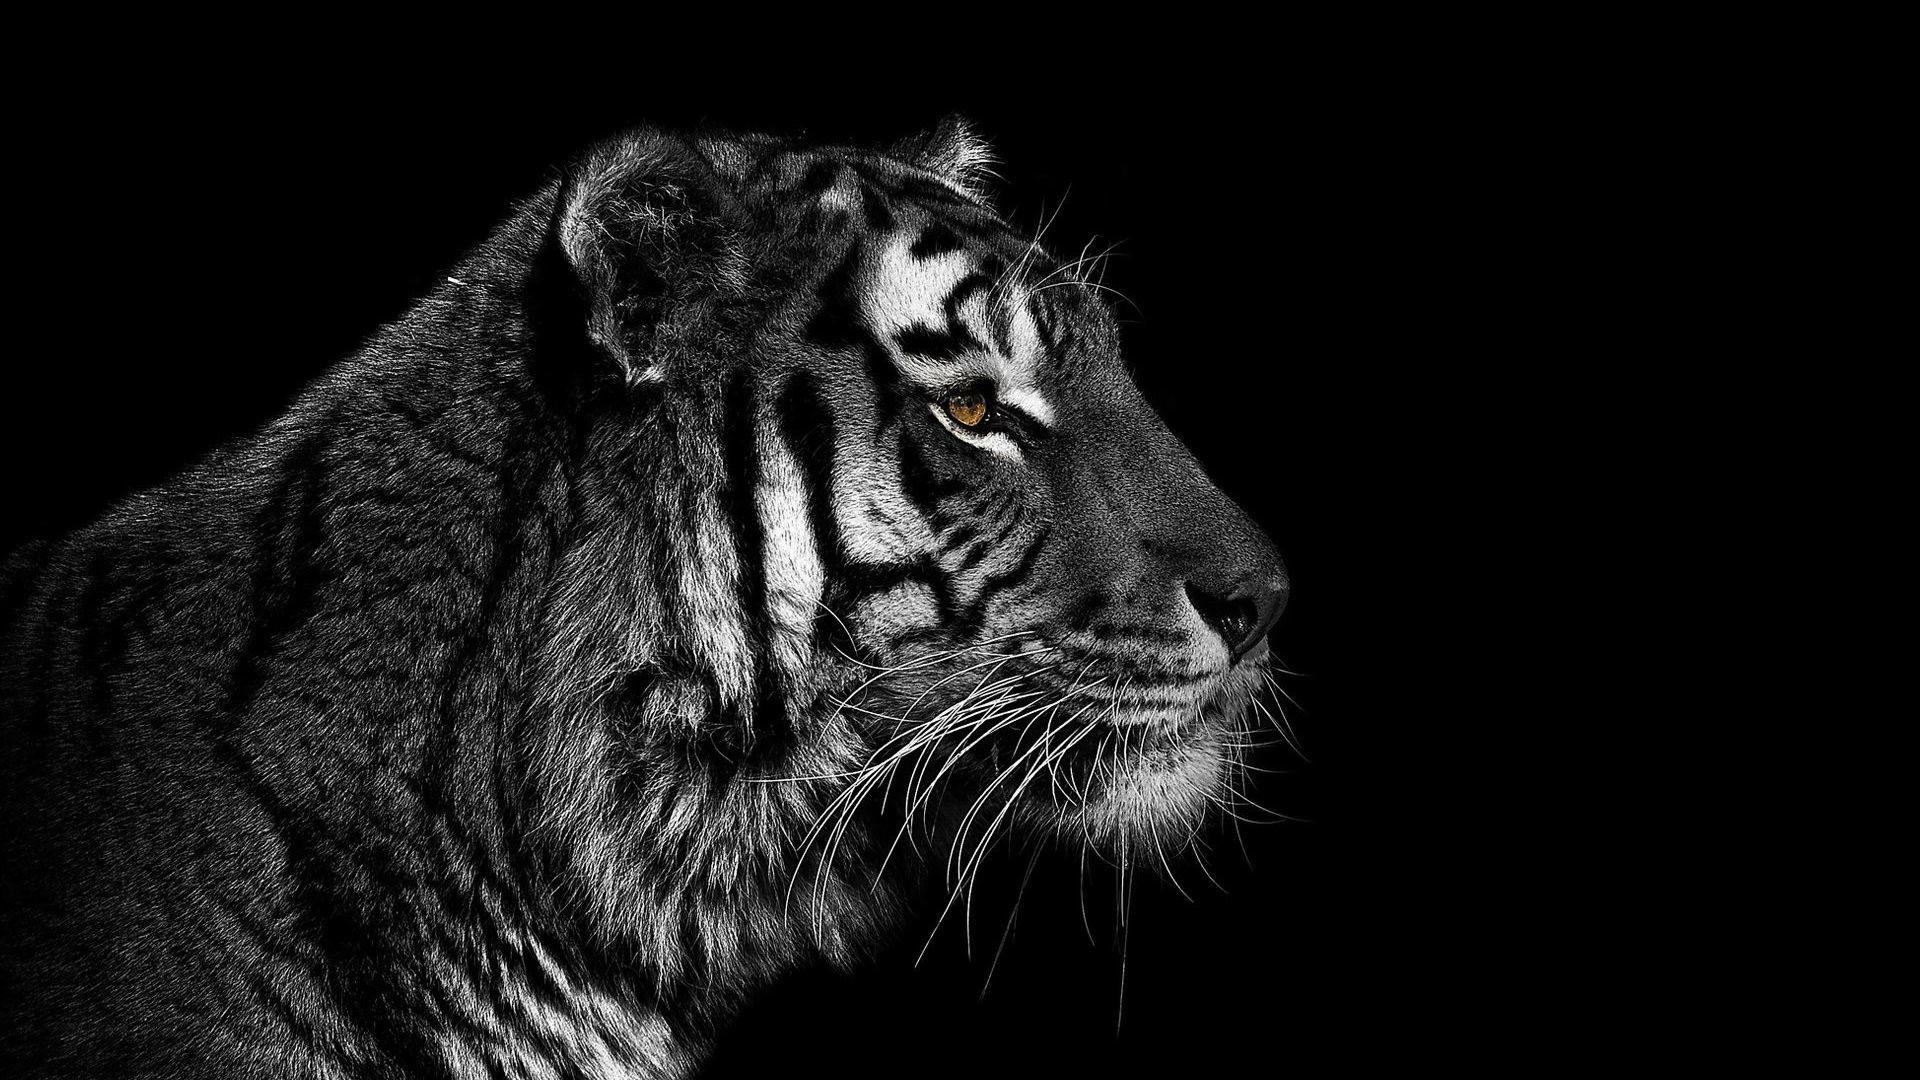 Tiger Hd Wallpaper Tiger Data Src Tiger Black And White 1920x1080 Wallpaper Teahub Io